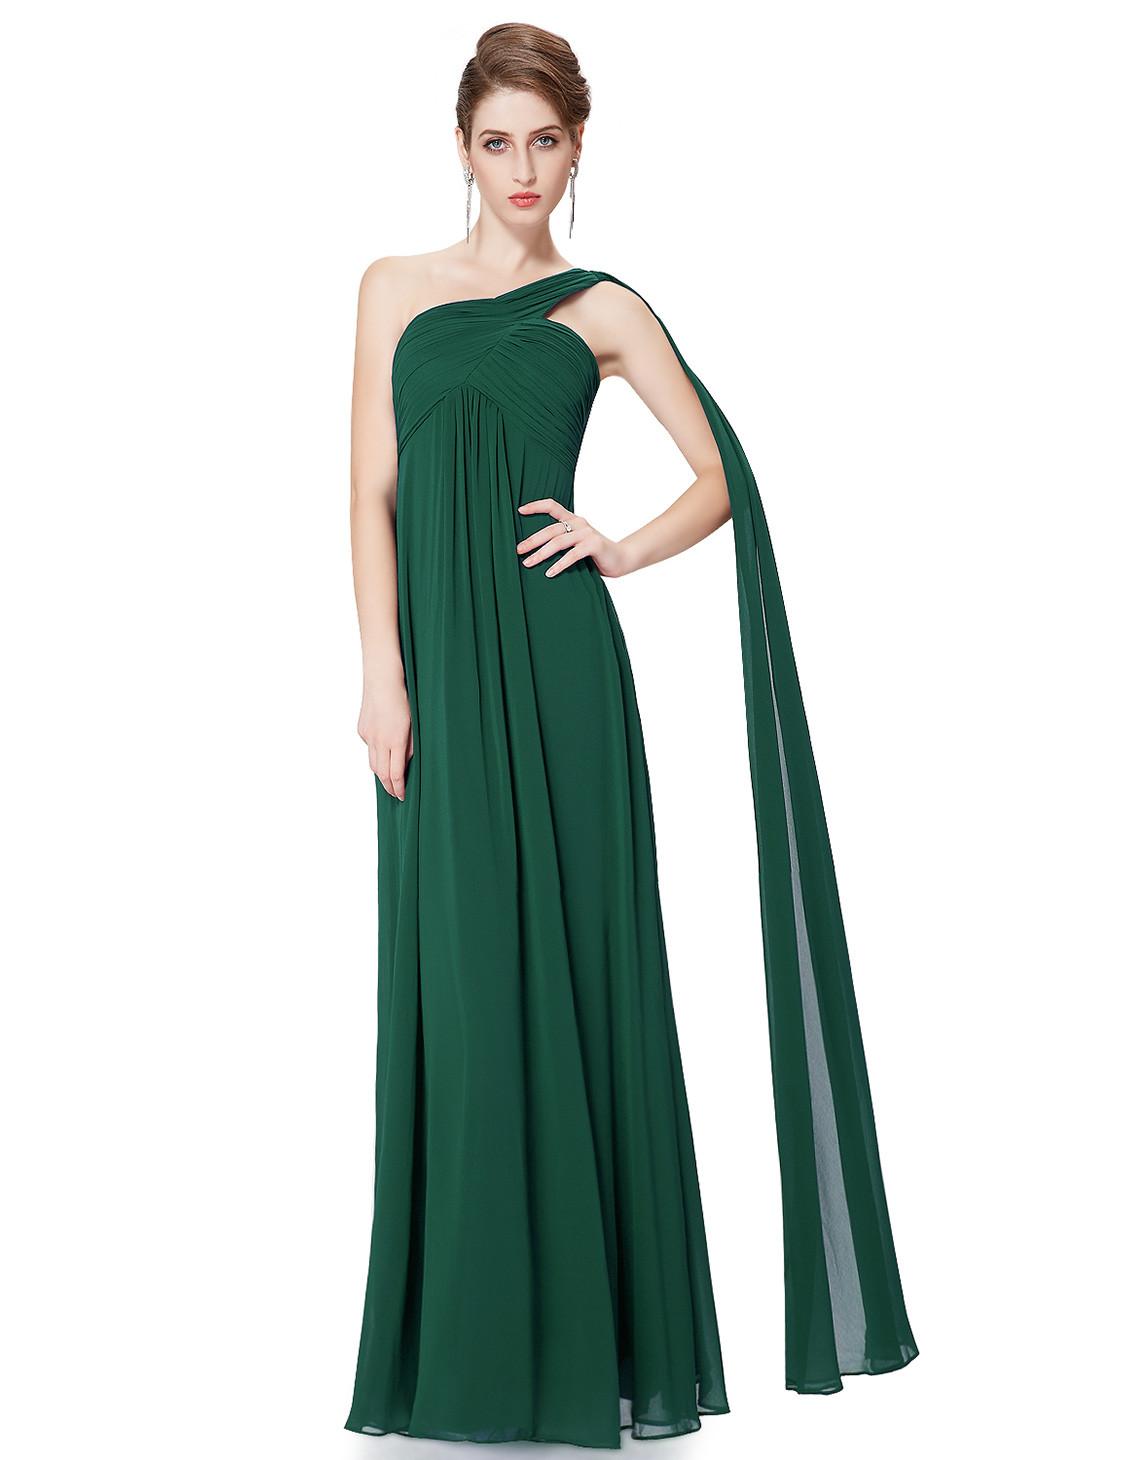 A-line Long One Shoulder Bridesmaid Dress Green